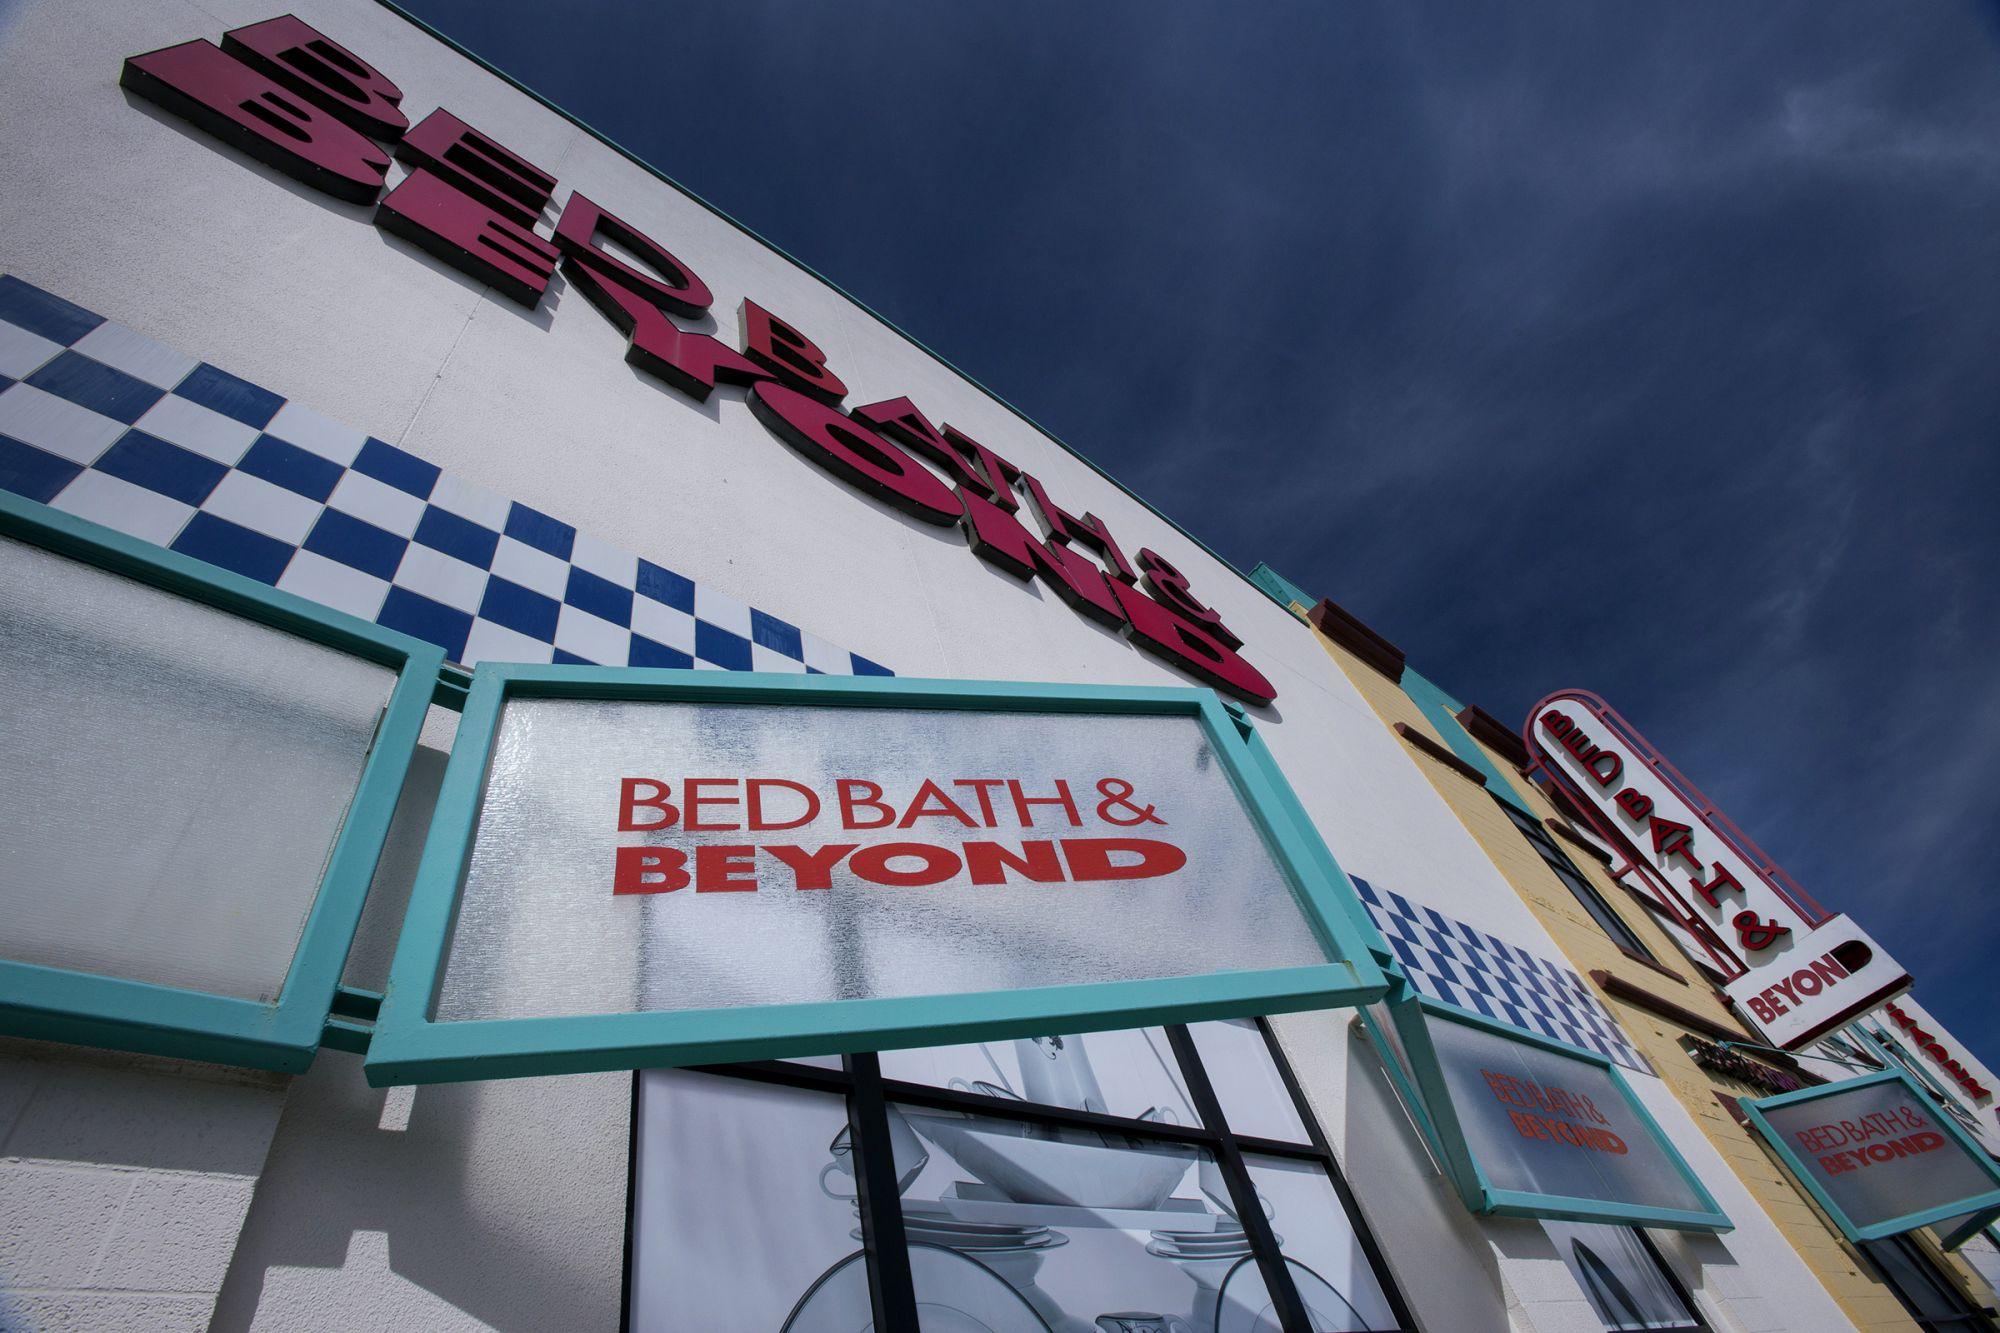 Bed Bath & Beyond Once Again Drives Entrepreneur Index™ Higher